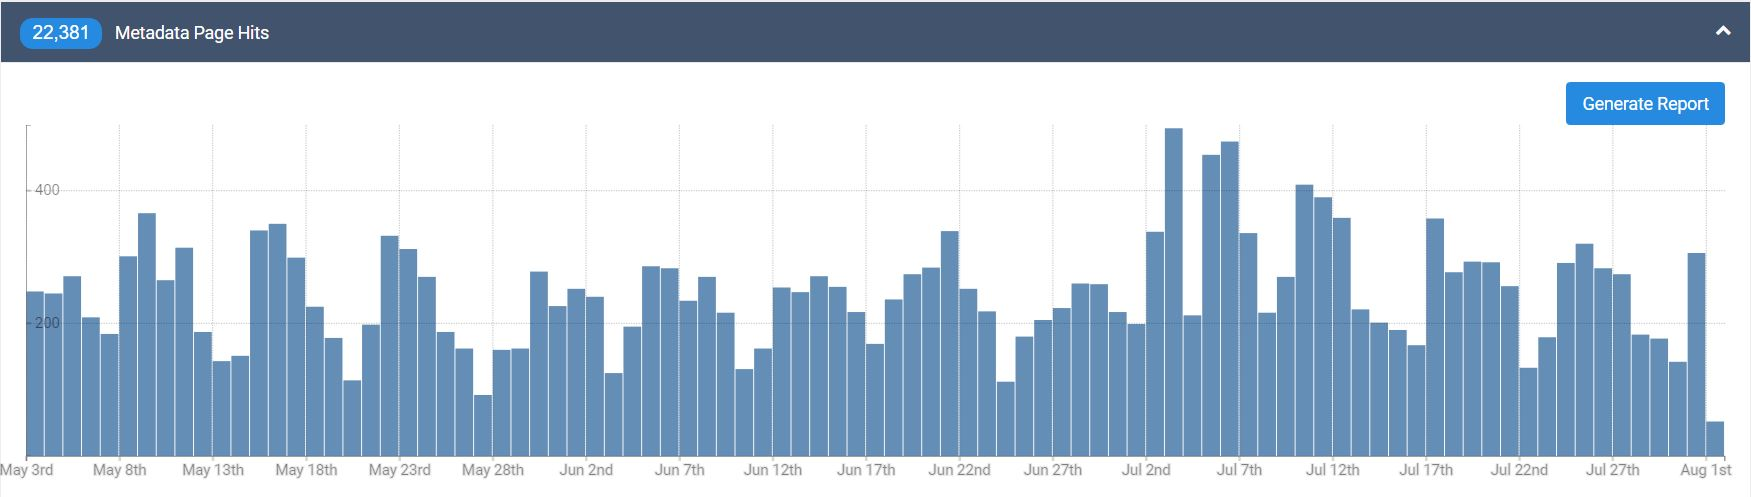 Metadata Page Hits